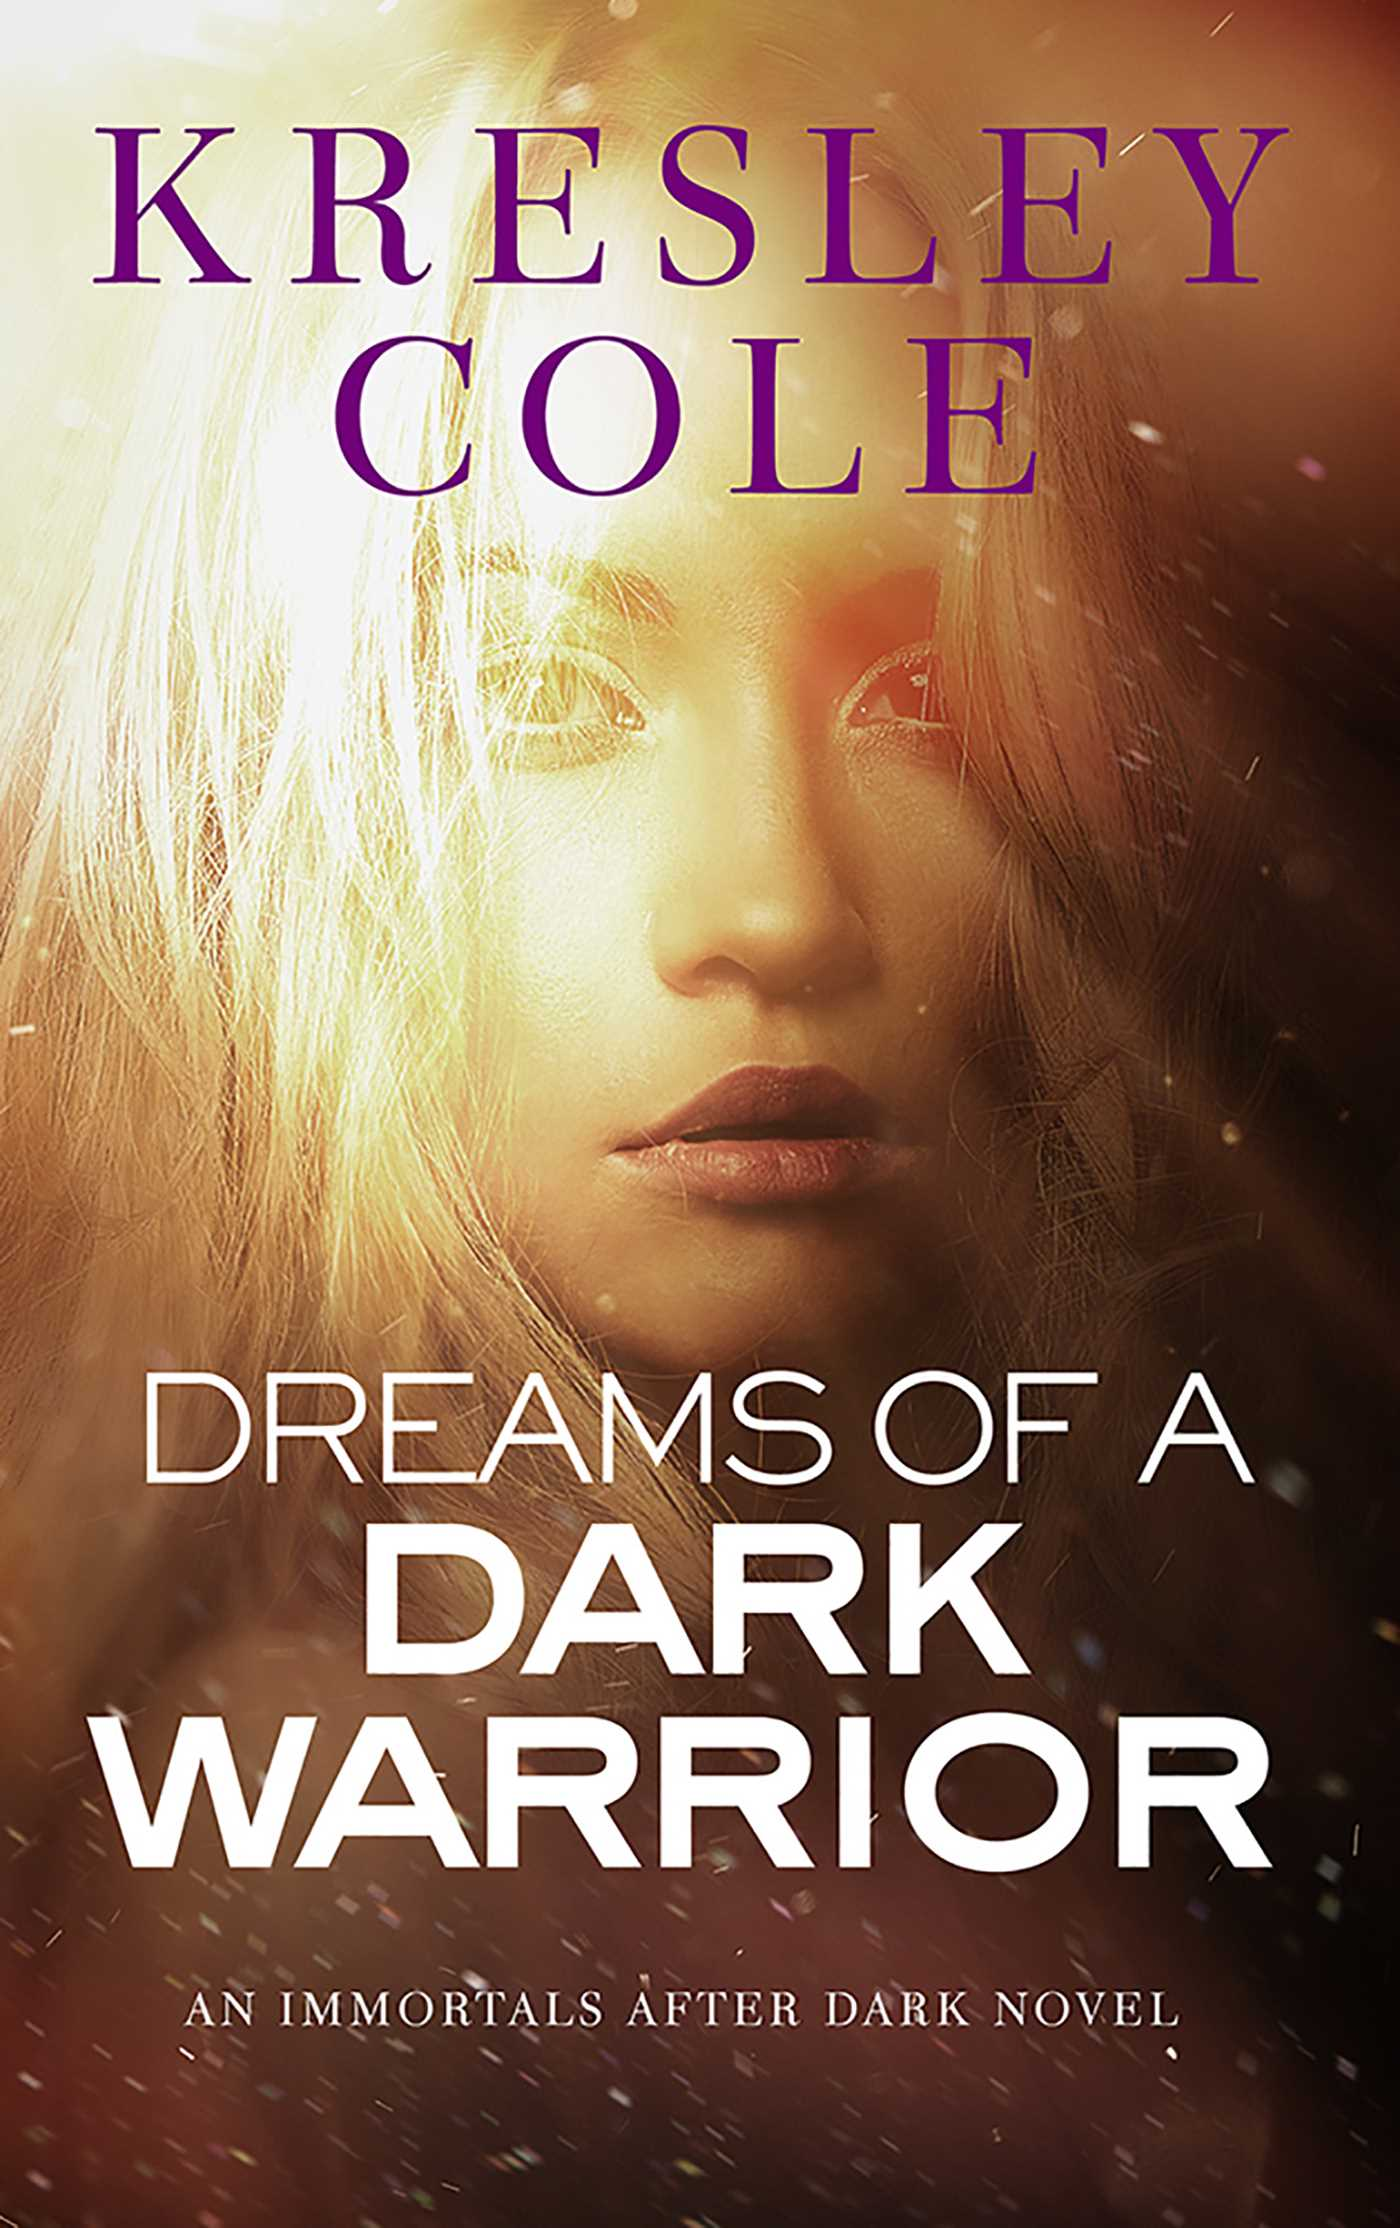 Dreams of a dark warrior ebook by kresley cole official publisher dreams of a dark warrior 9781439177013 hr fandeluxe Images